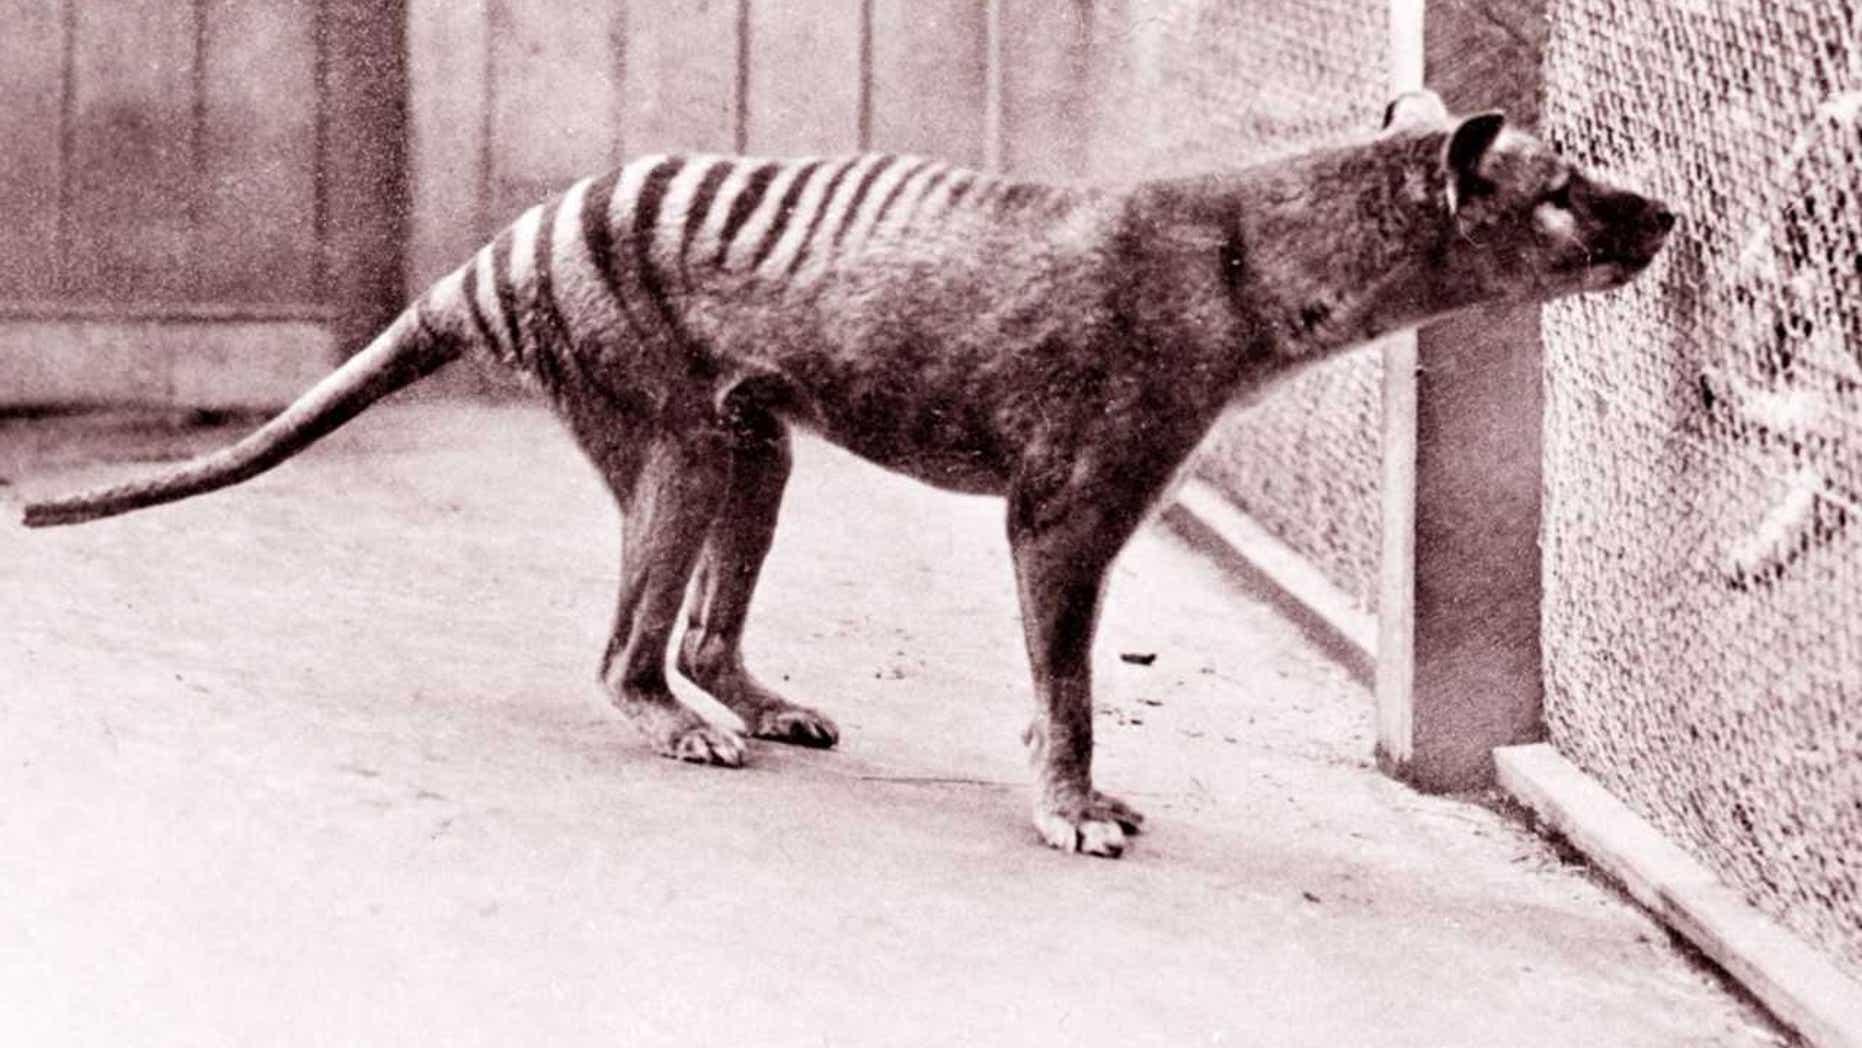 Benjamin, the last Tasmanian tiger in captivity, died in September 1936. (Credit: Getty Images)